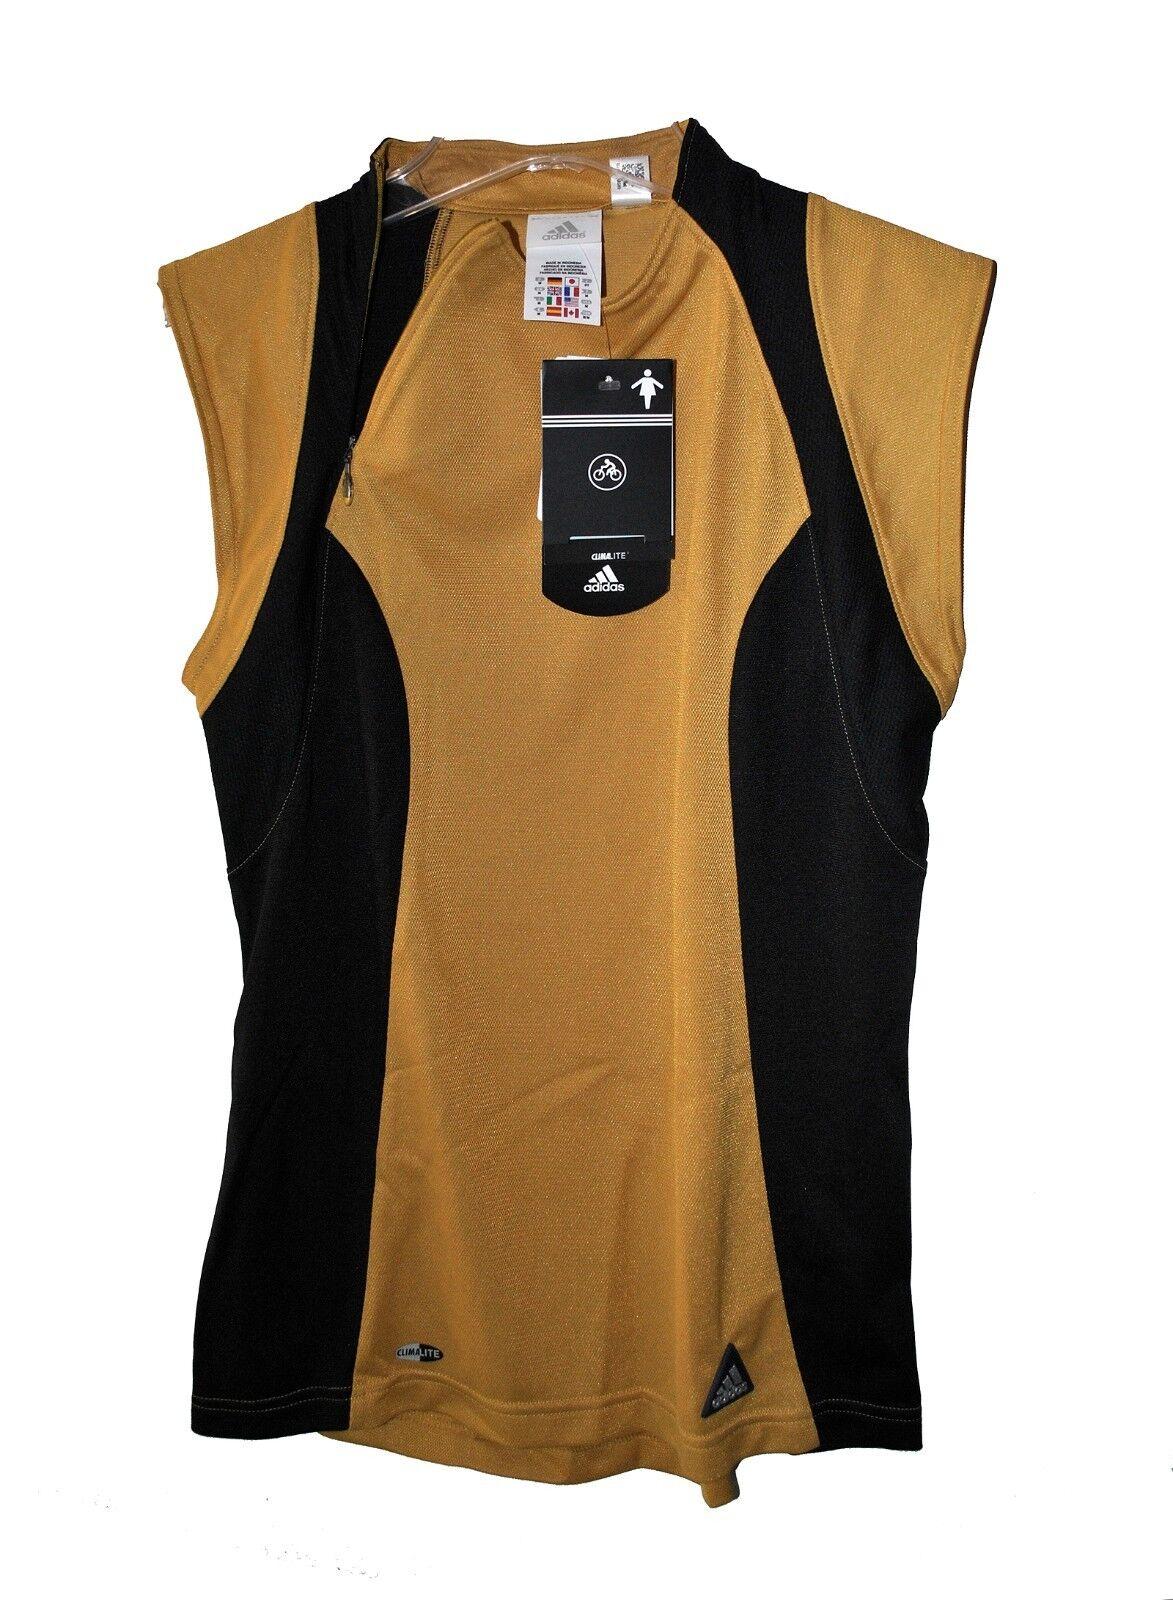 Nuevo jersey de mujer Adidas Trail SL sin mangas oro negro climalite reg: $ 49.95